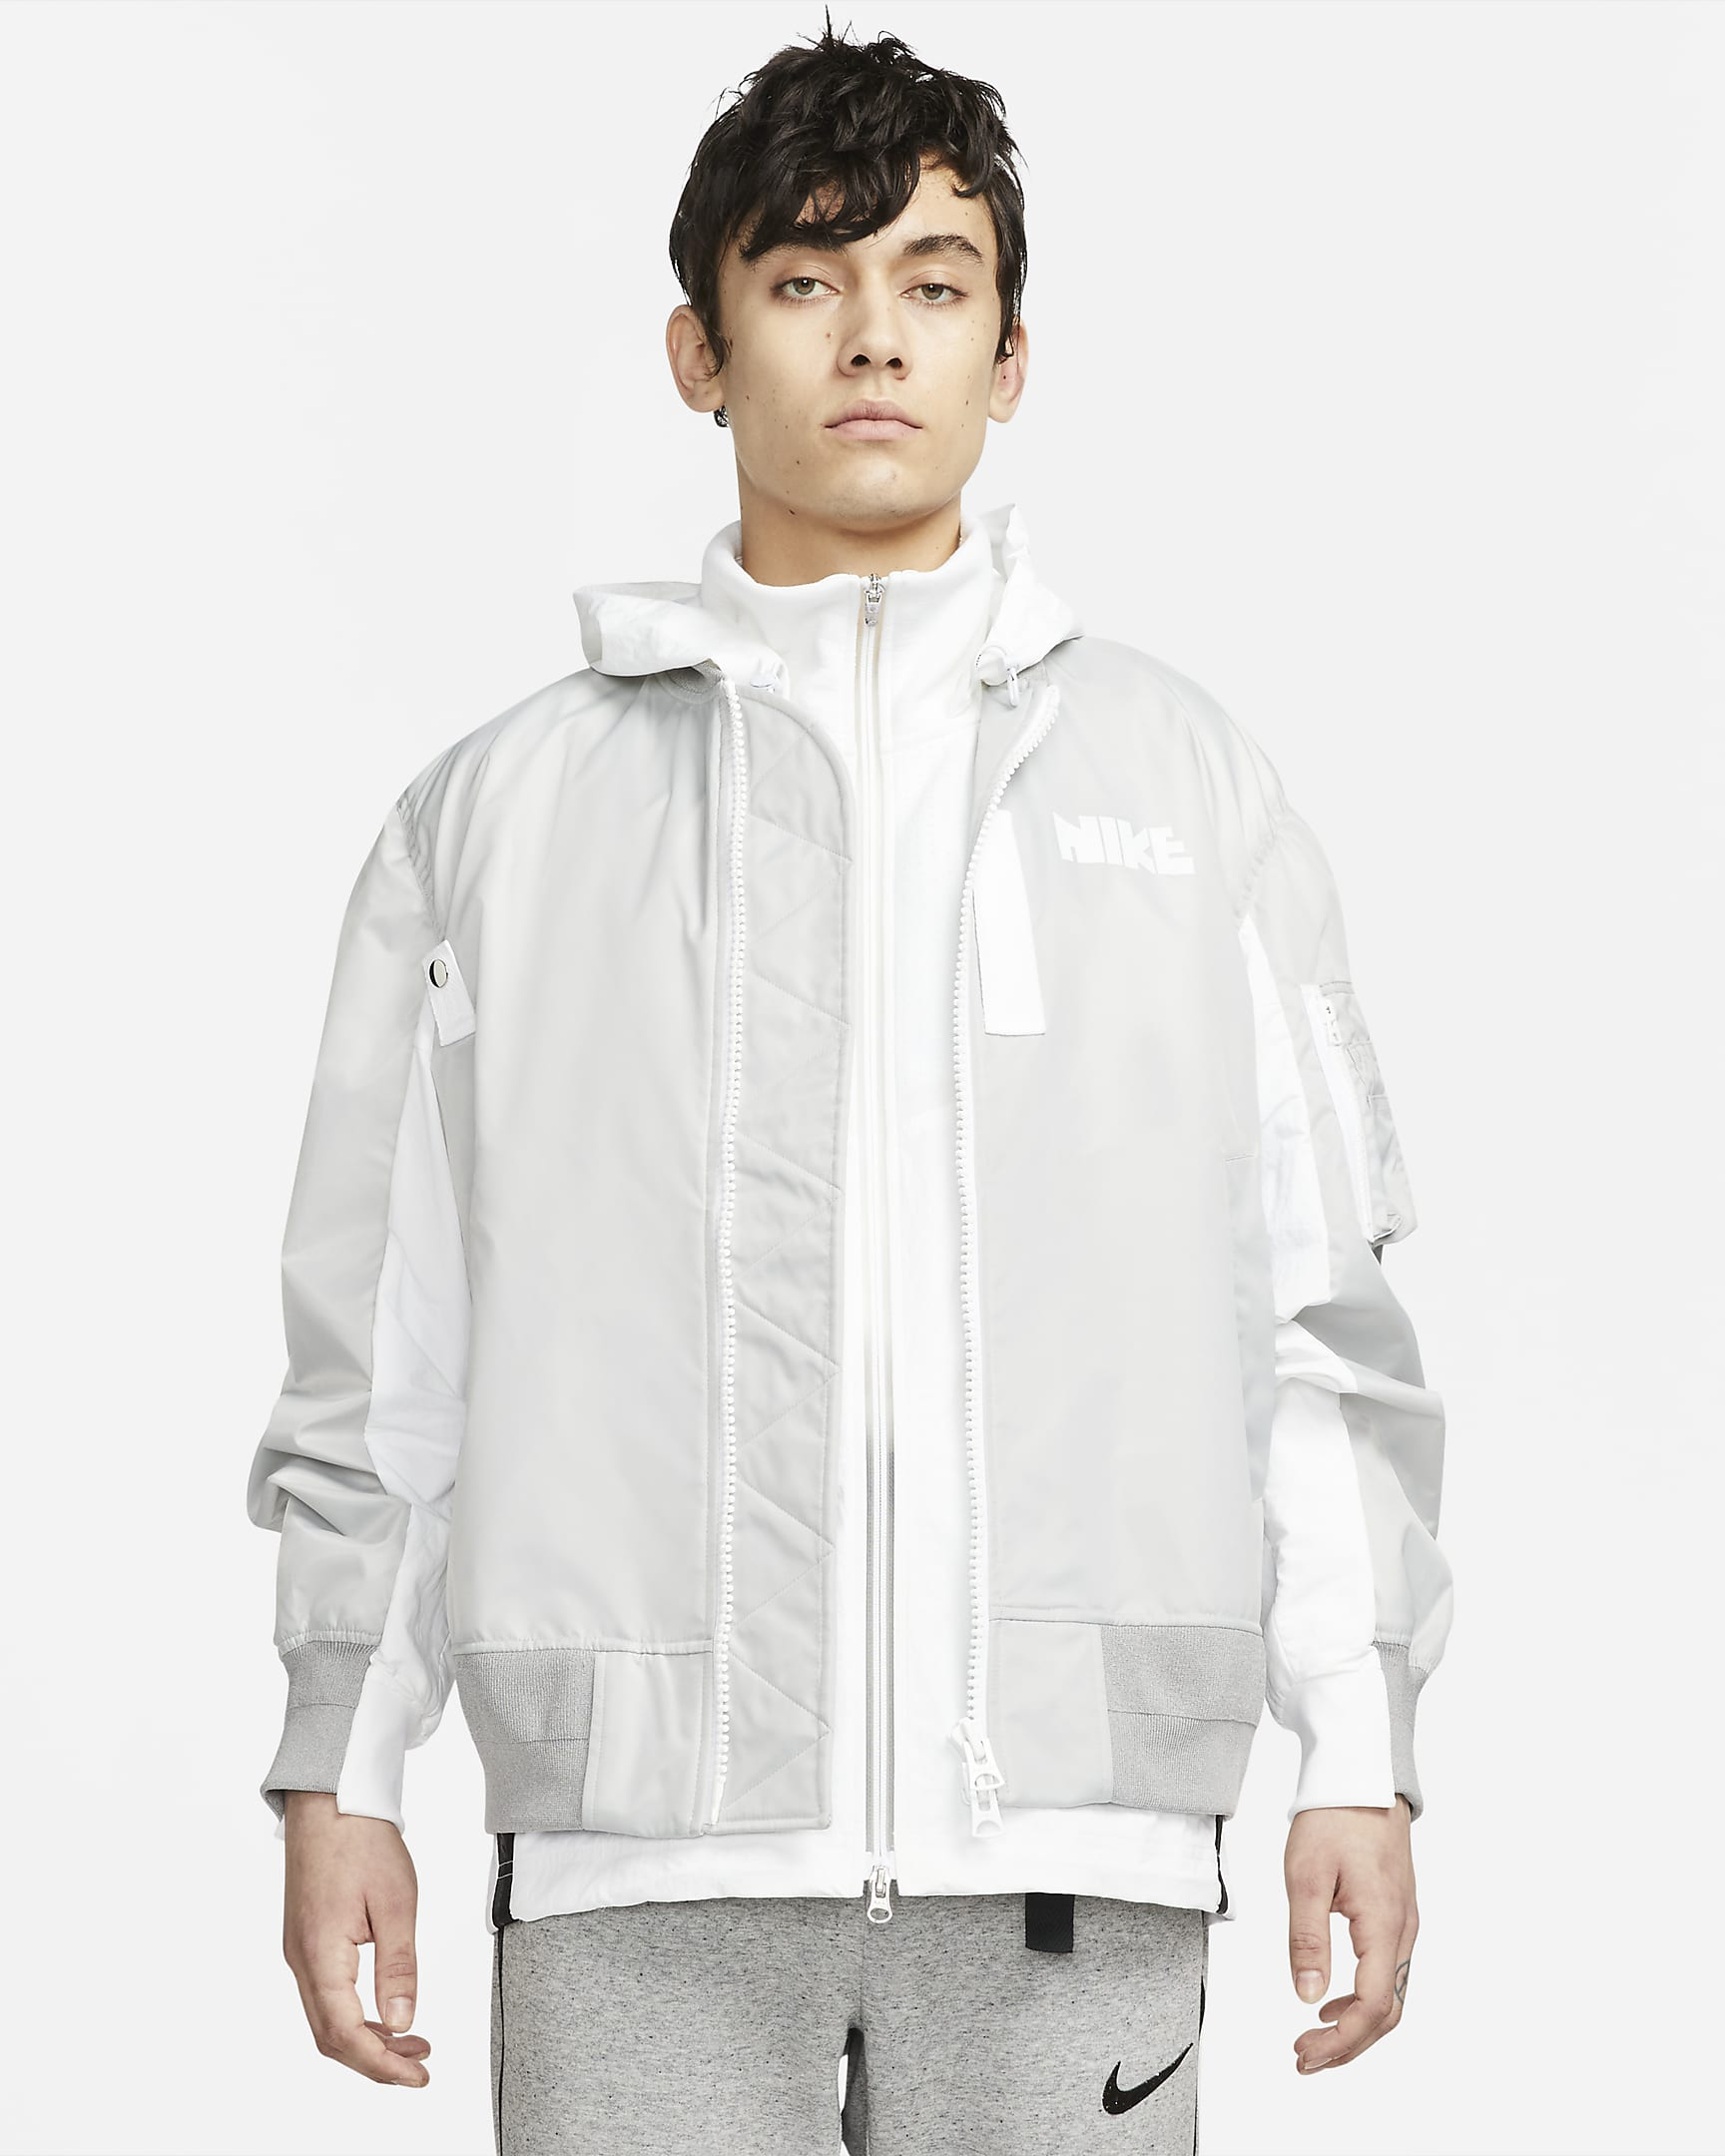 sacai-mens-jacket-Sm6C4c.png copy